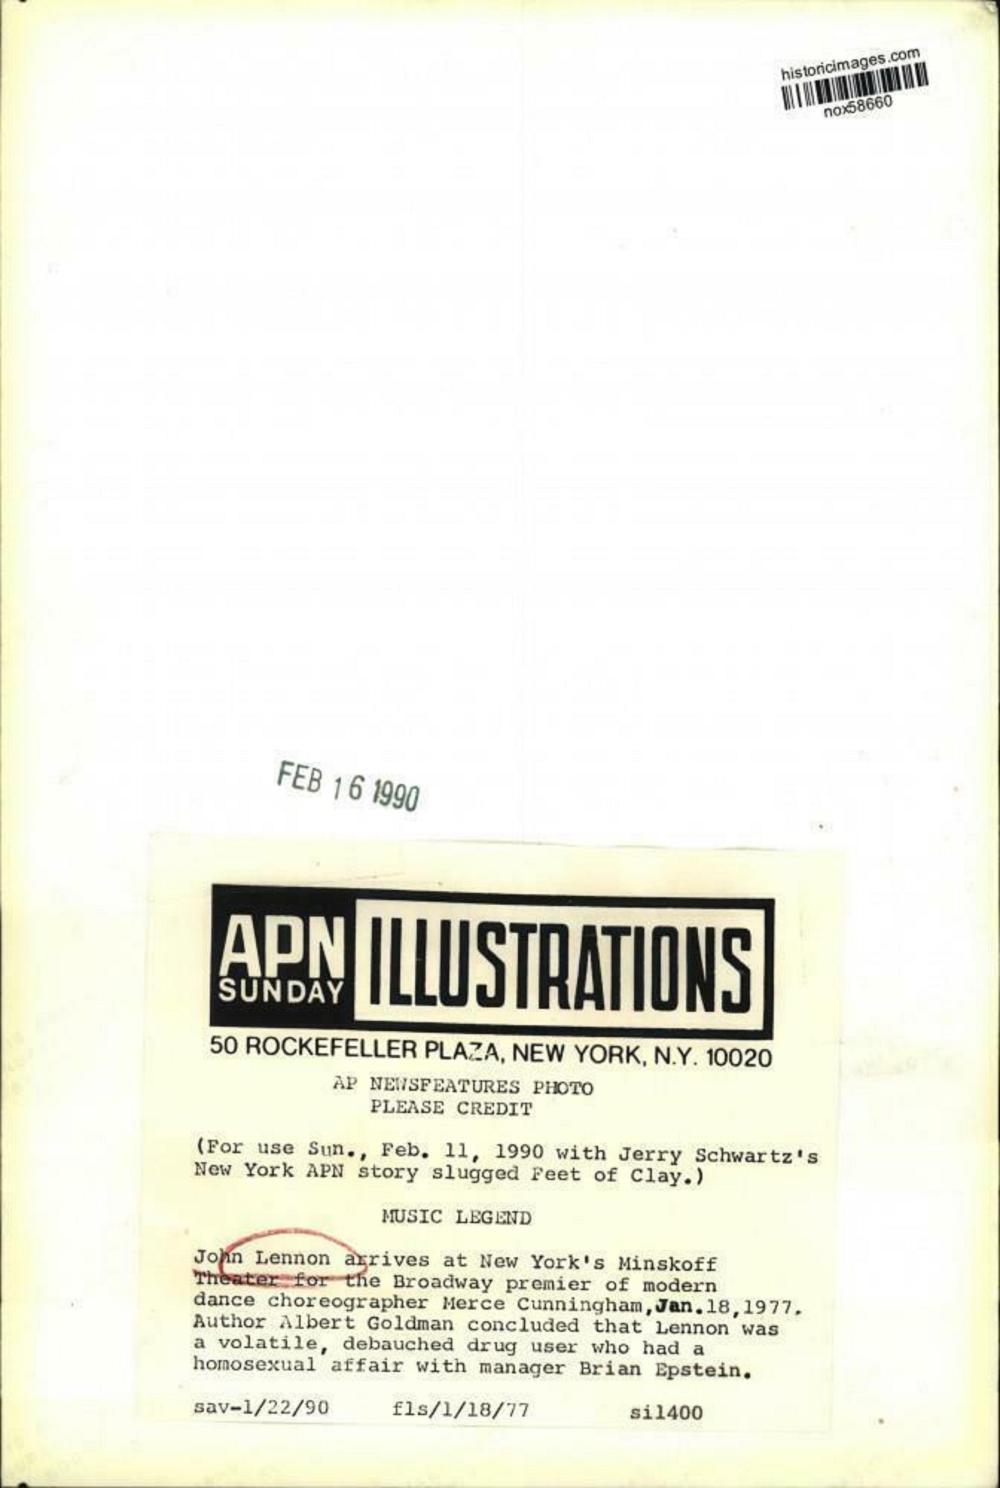 1977 John Lennon arrives at New York's Minskoff Theater – press photo